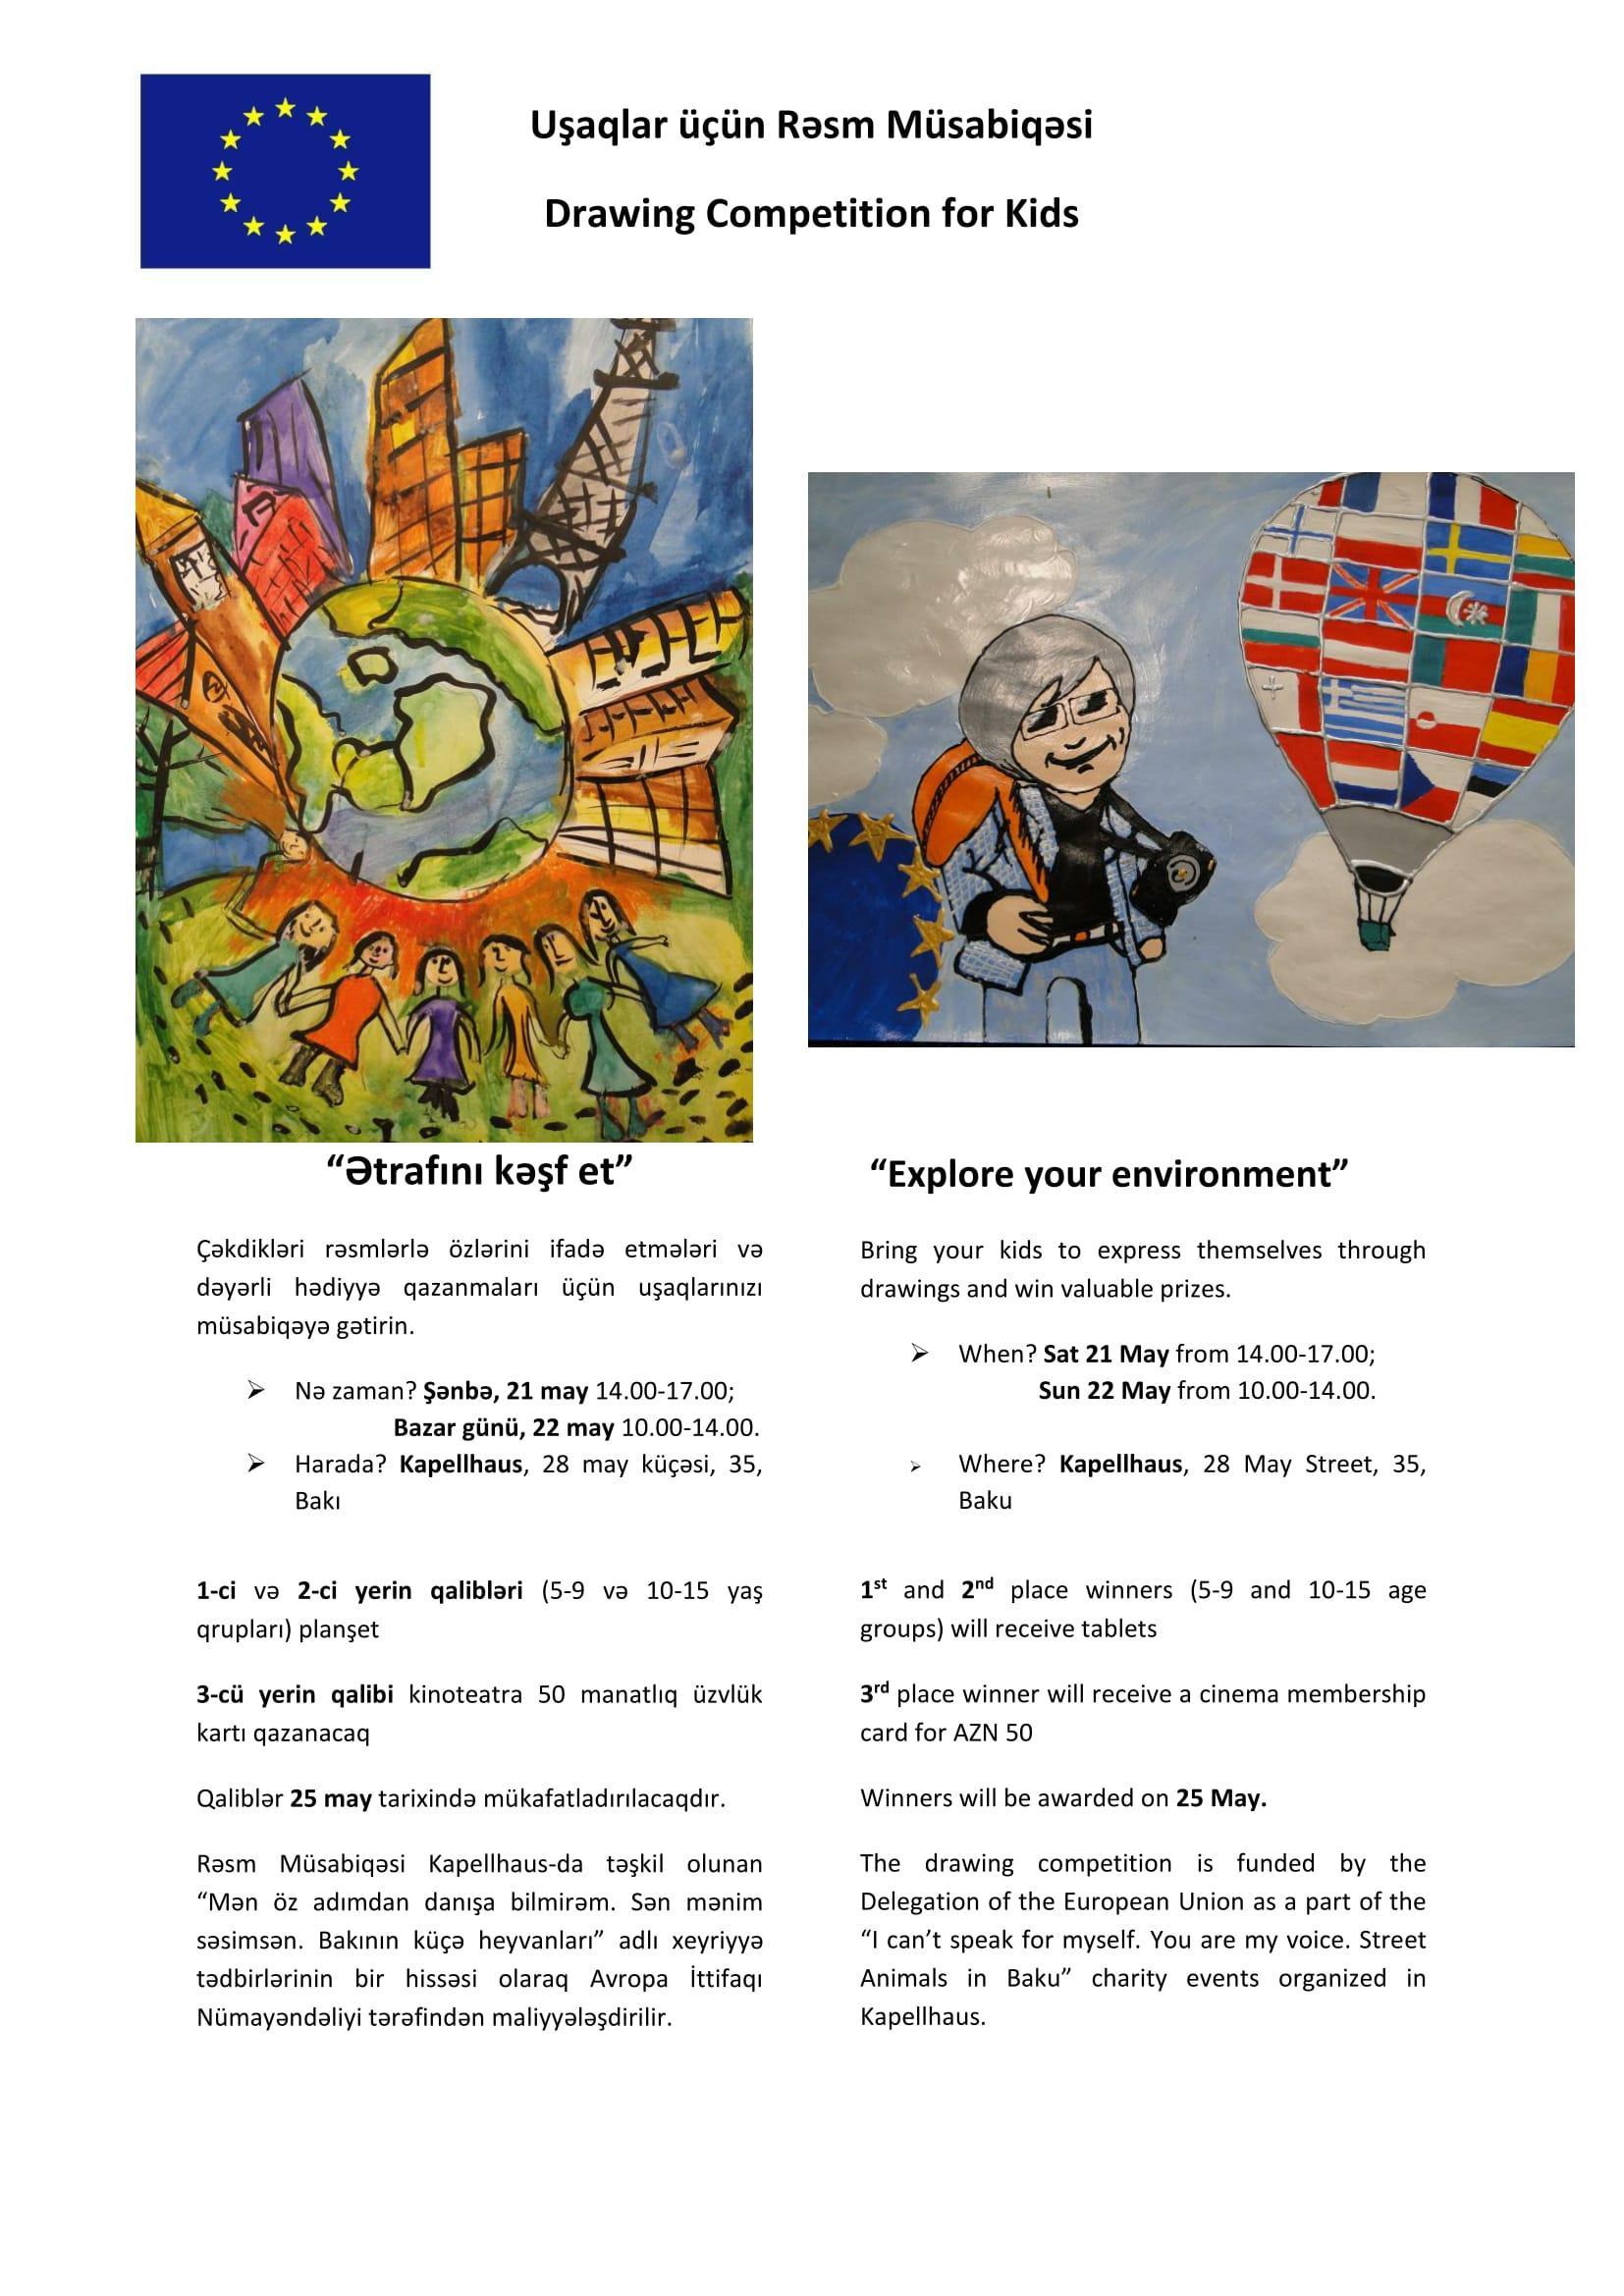 EU organizes drawing competition for children in Azerbaijan